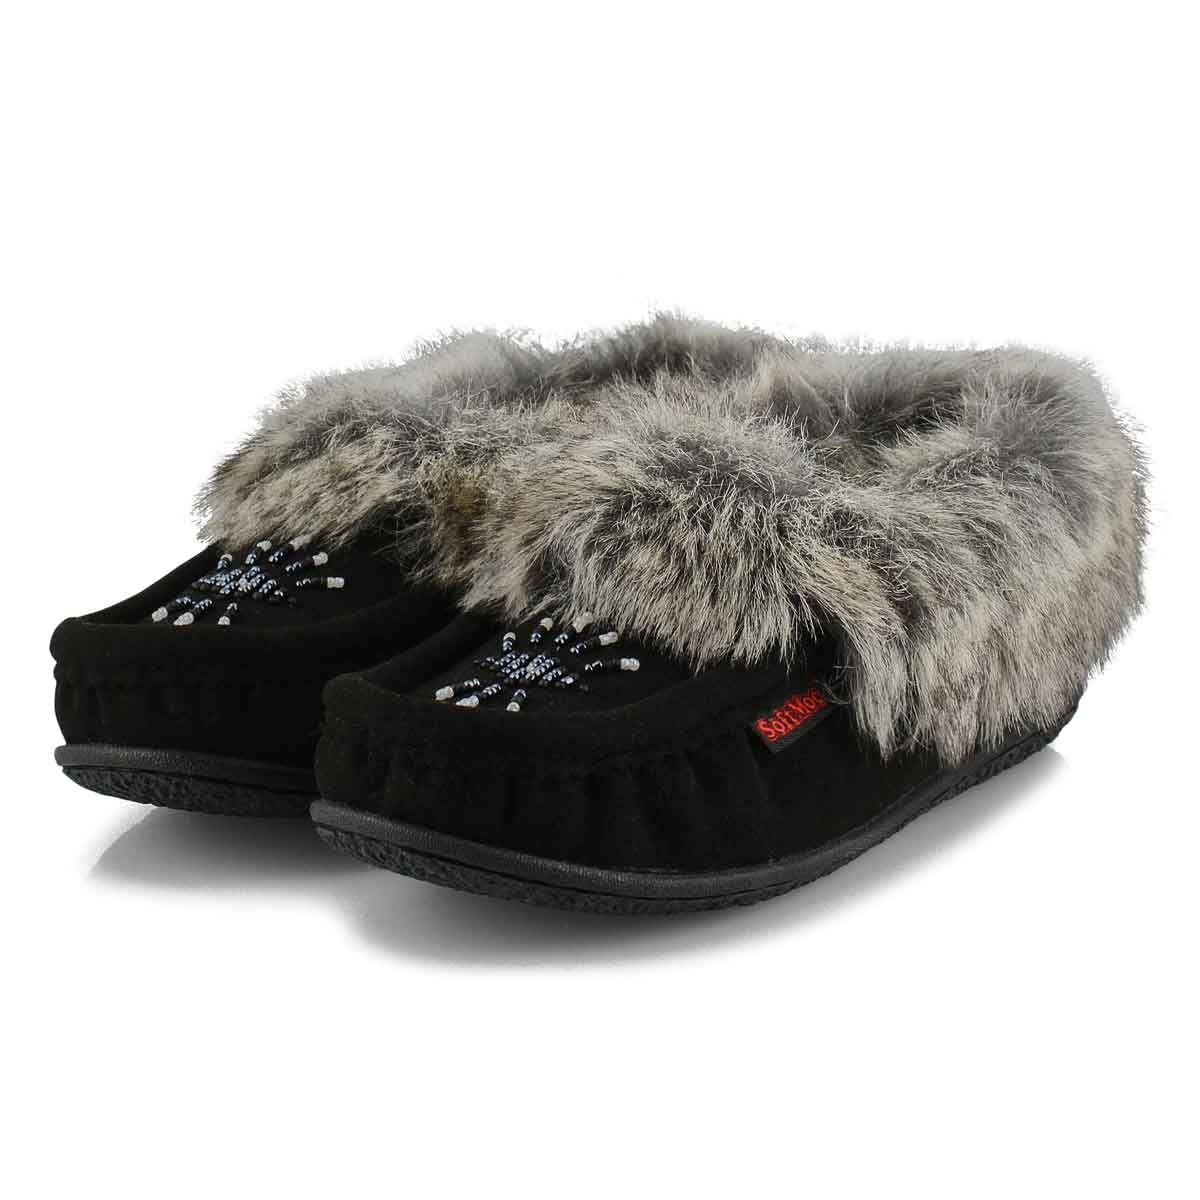 Women's Cute 5 V Faux Rabbit Fur Moccasin - Black